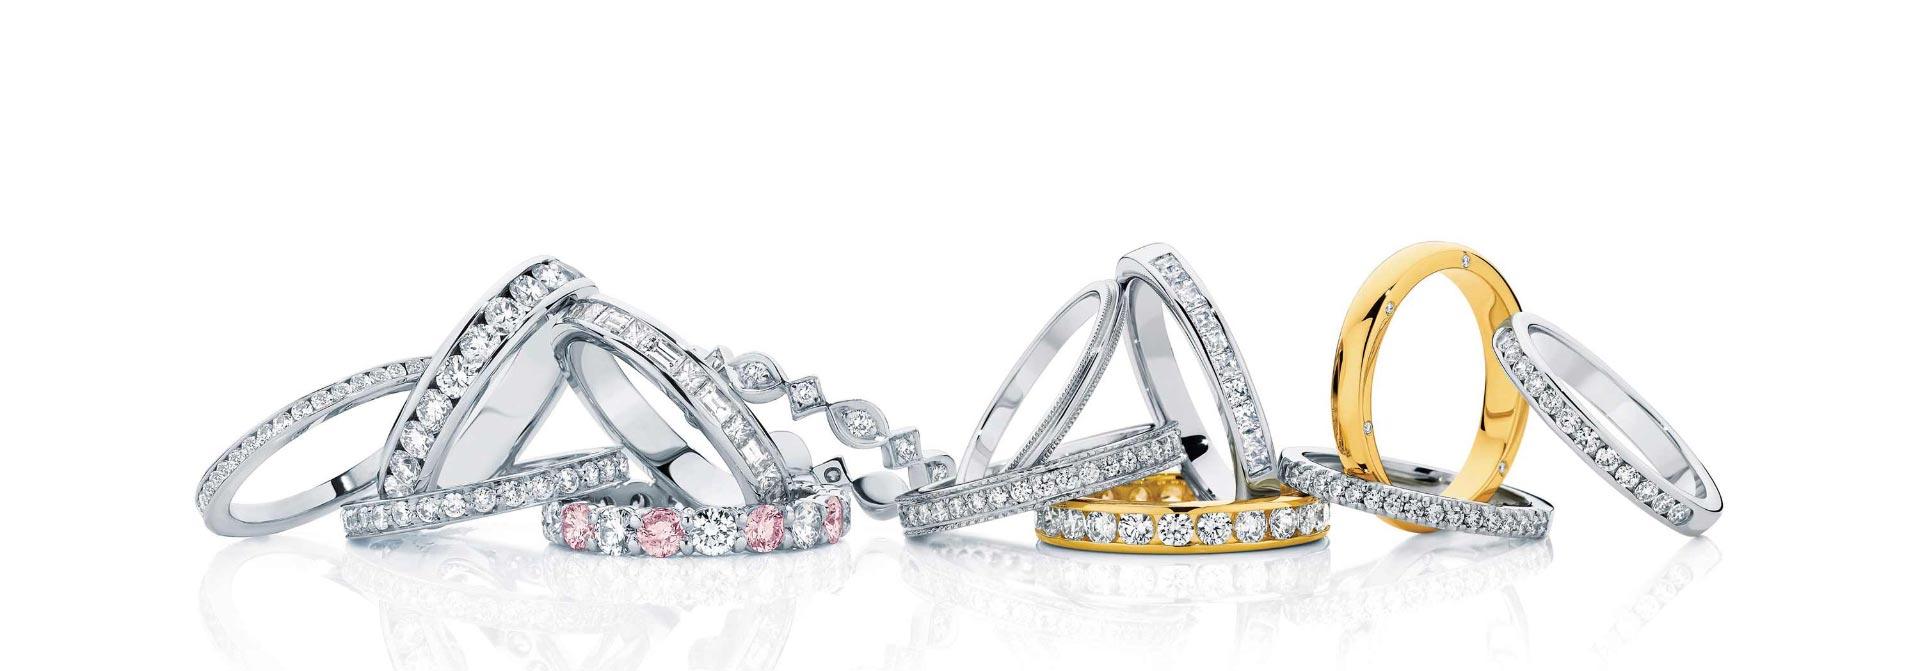 Jewellery Rings & Diamonds